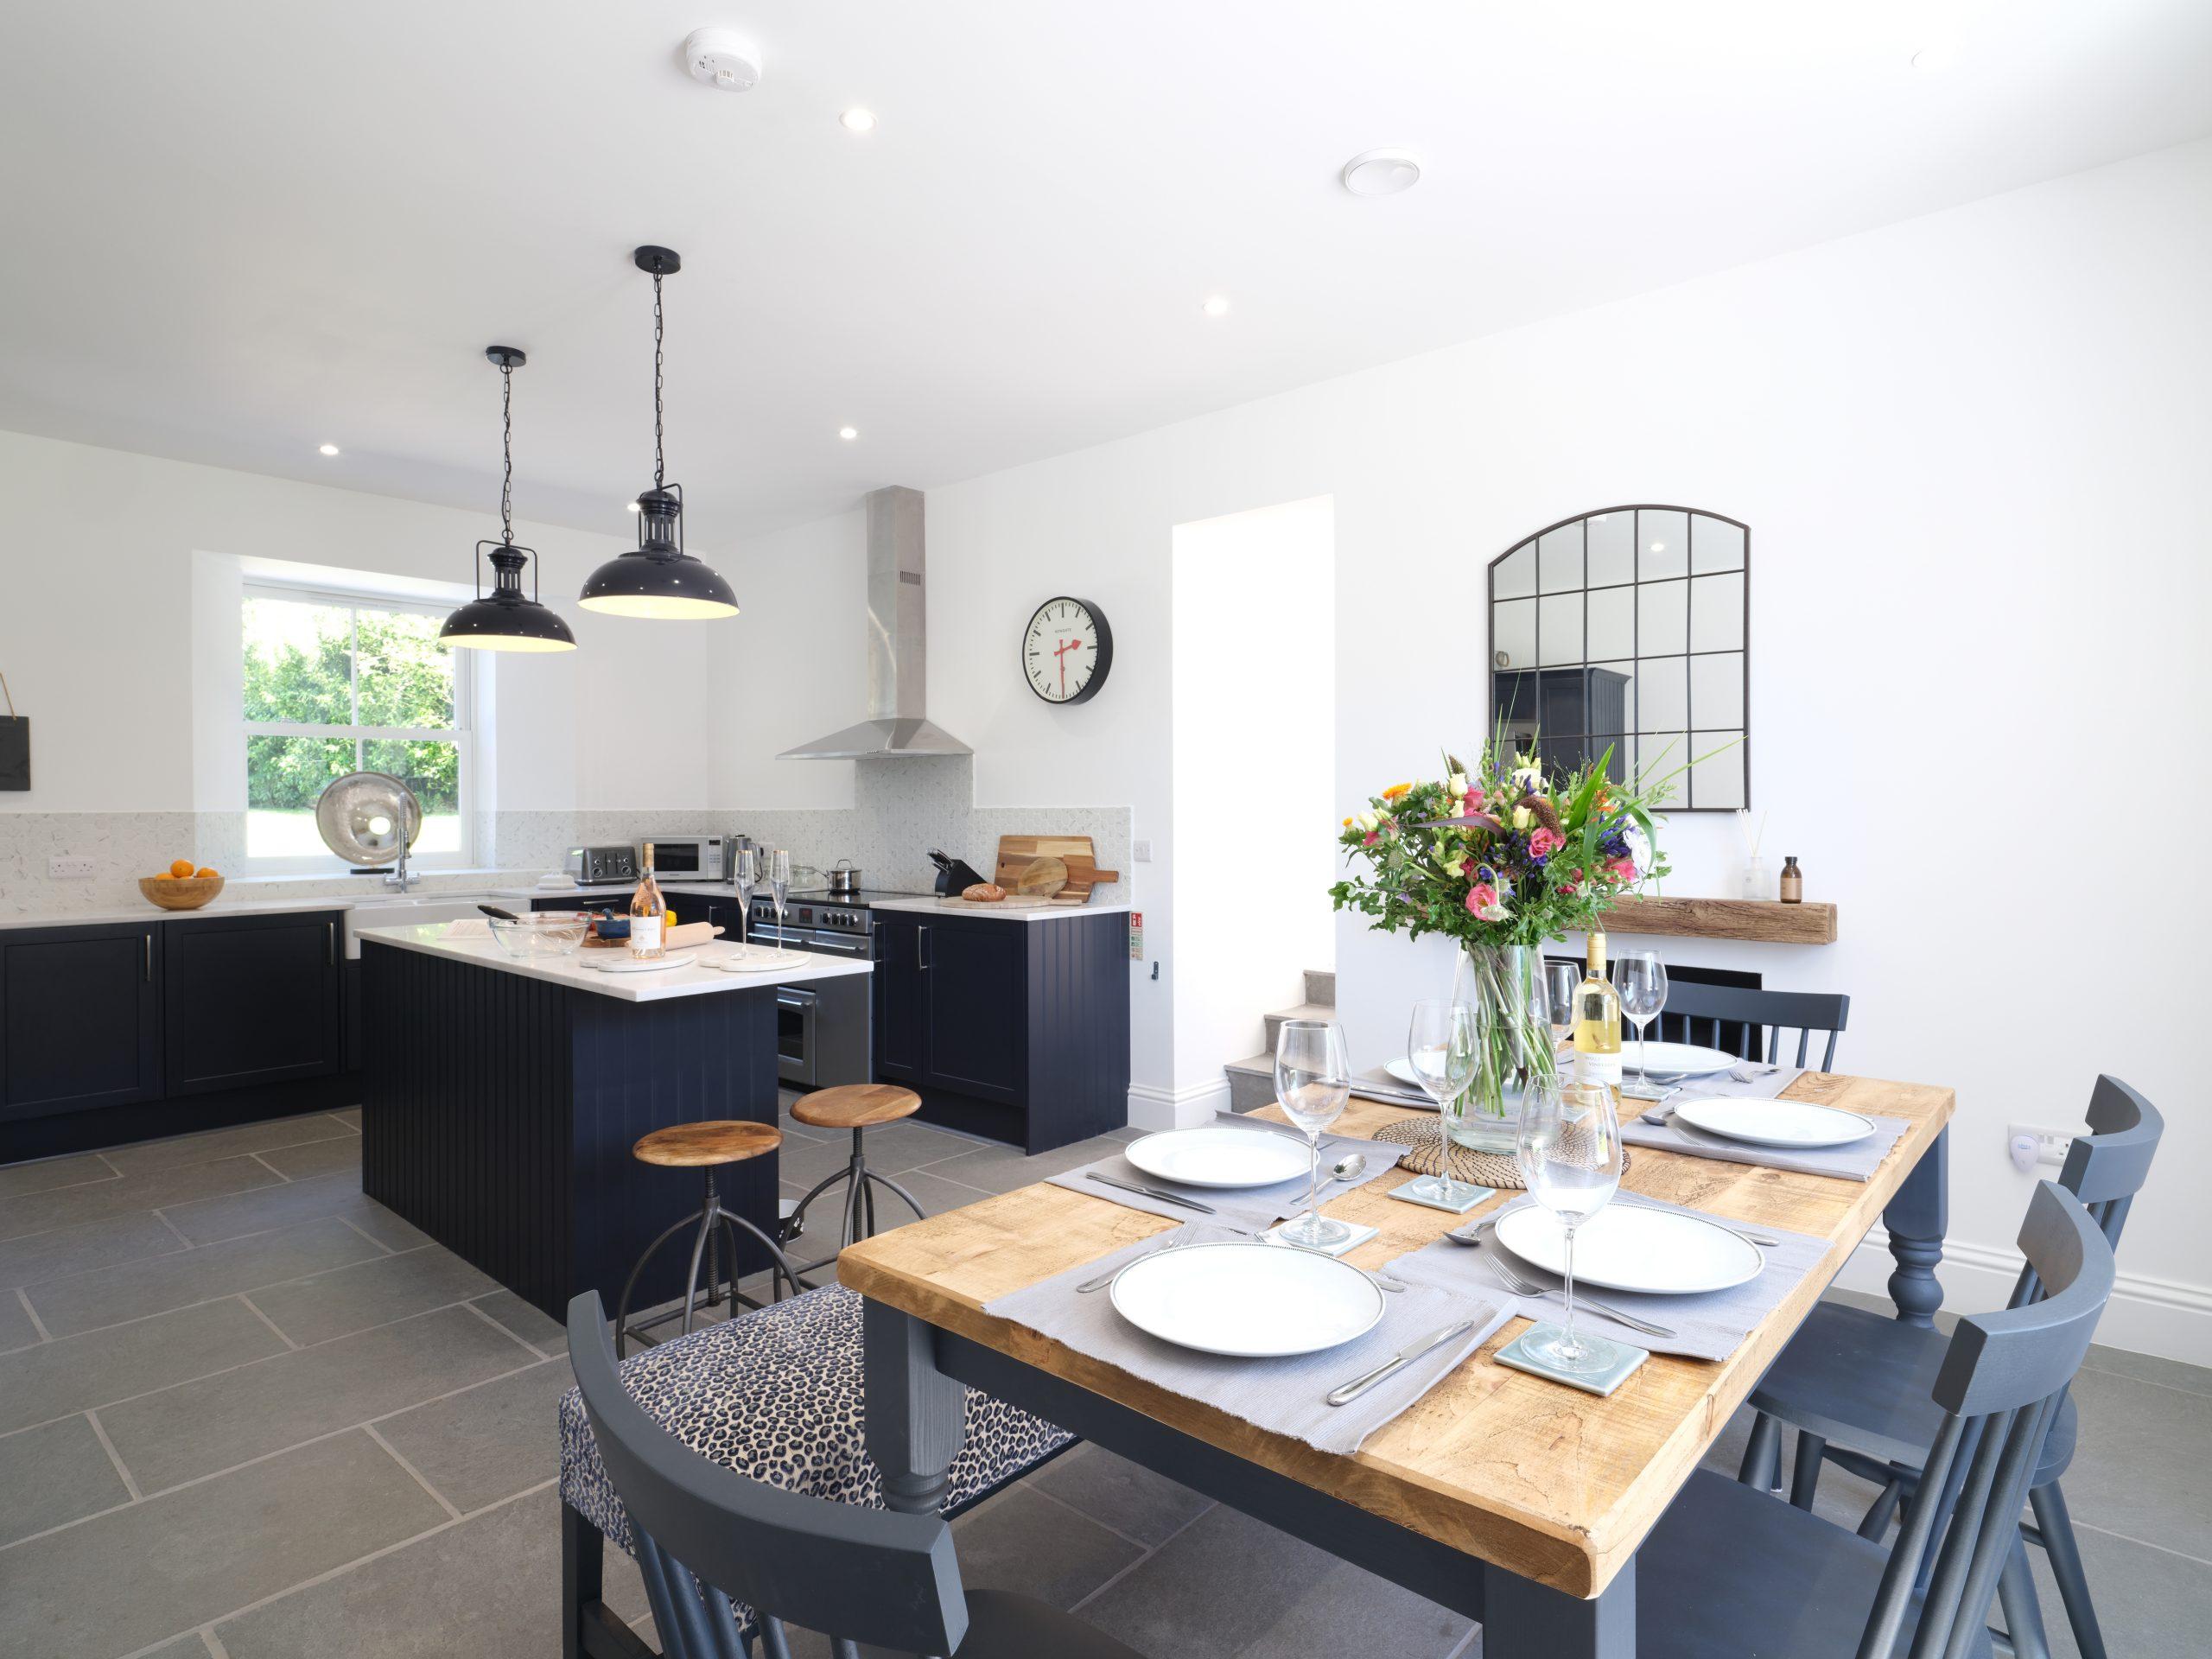 Drym House: Dining Area & Kitchen